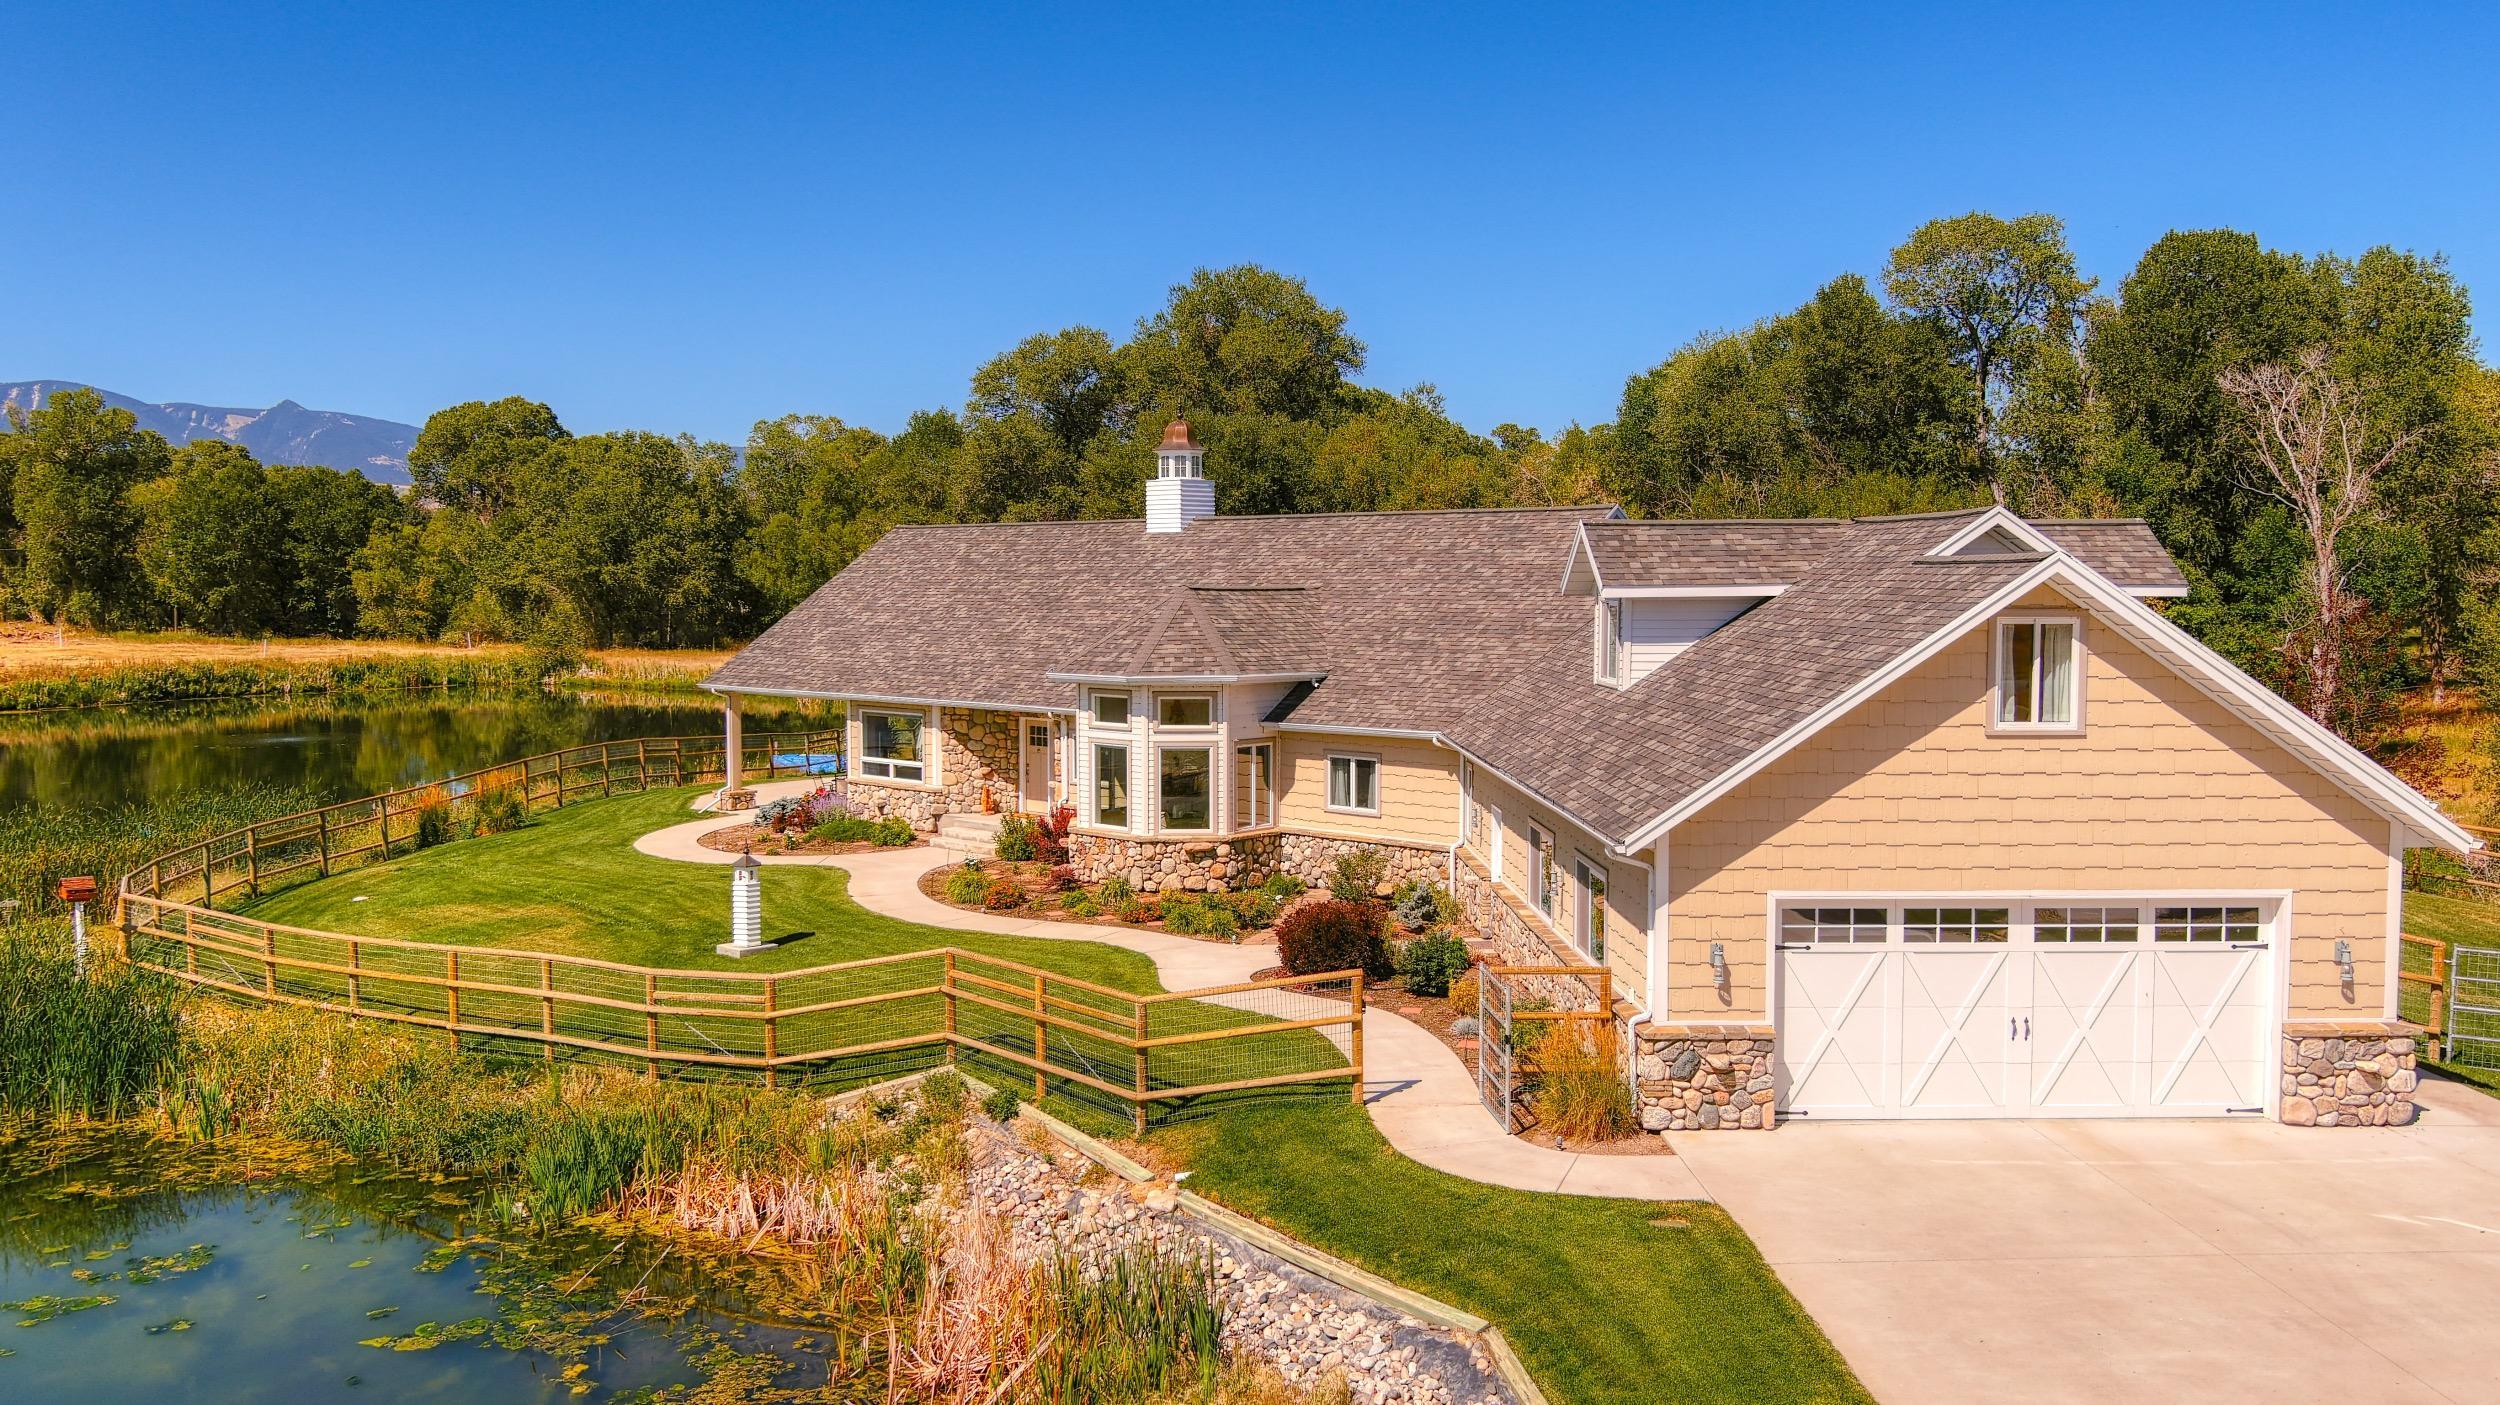 4 Killeen Circle, Sheridan, Wyoming 82801, 3 Bedrooms Bedrooms, ,3 BathroomsBathrooms,Residential,For Sale,Killeen,21-646